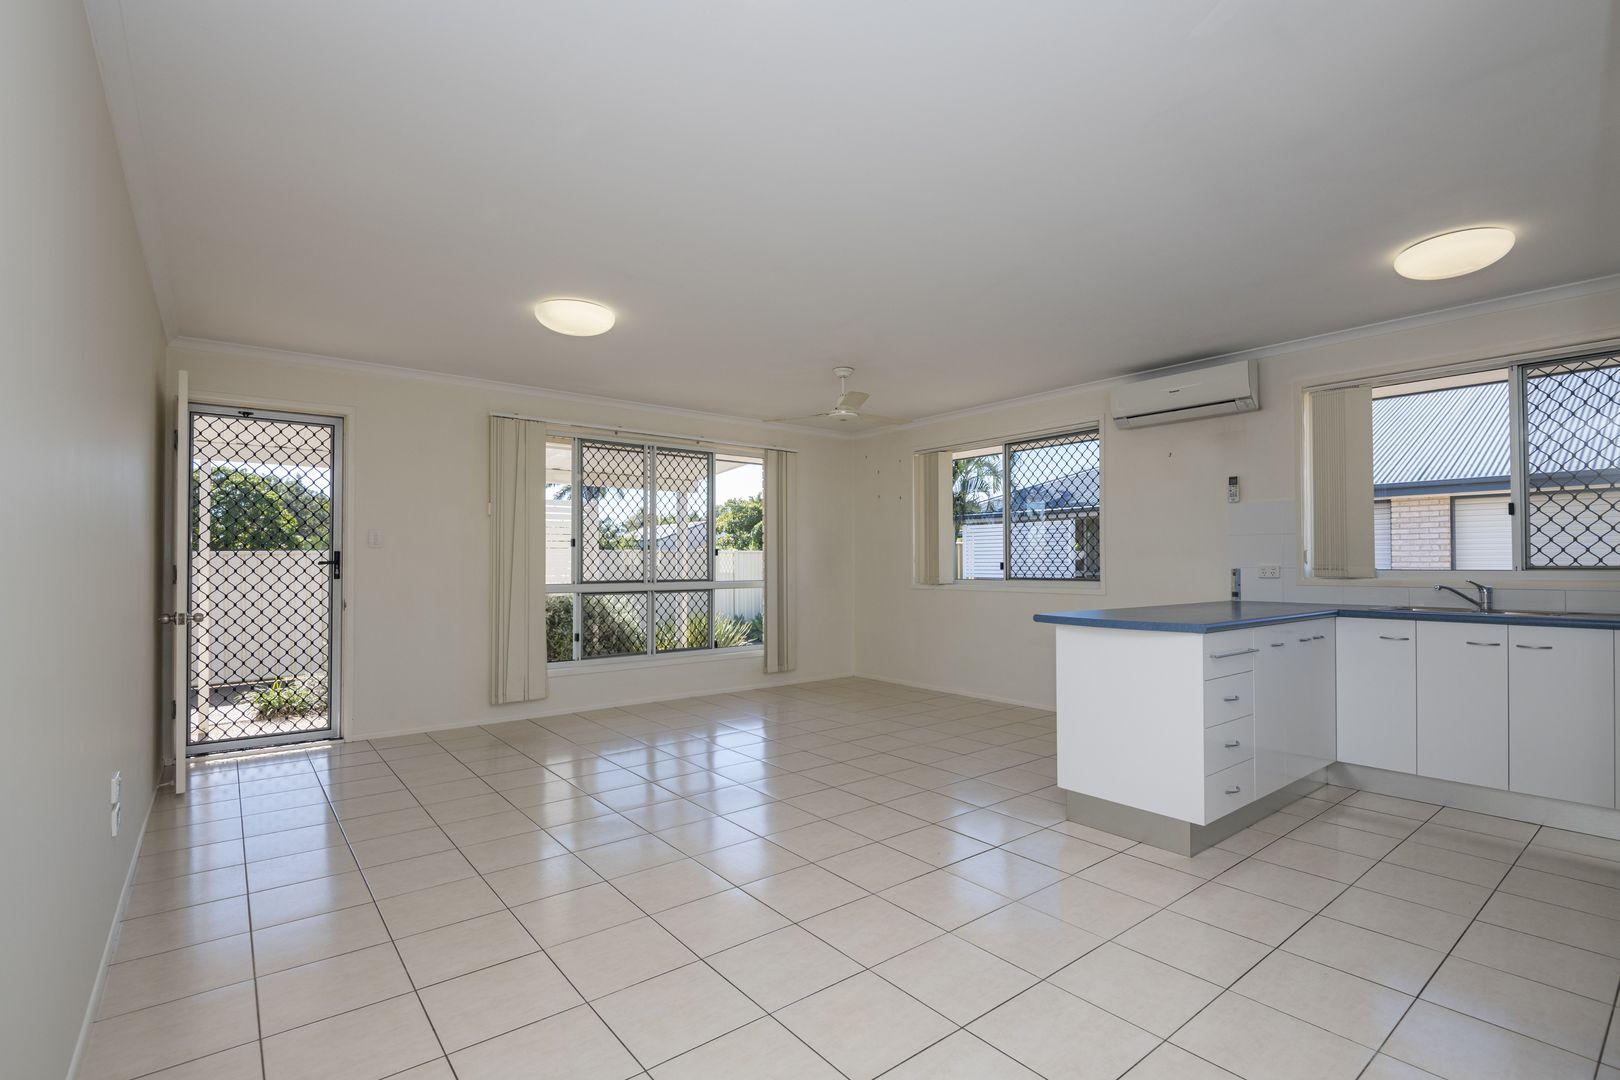 2/6 Water Street, Bundaberg South QLD 4670, Image 0